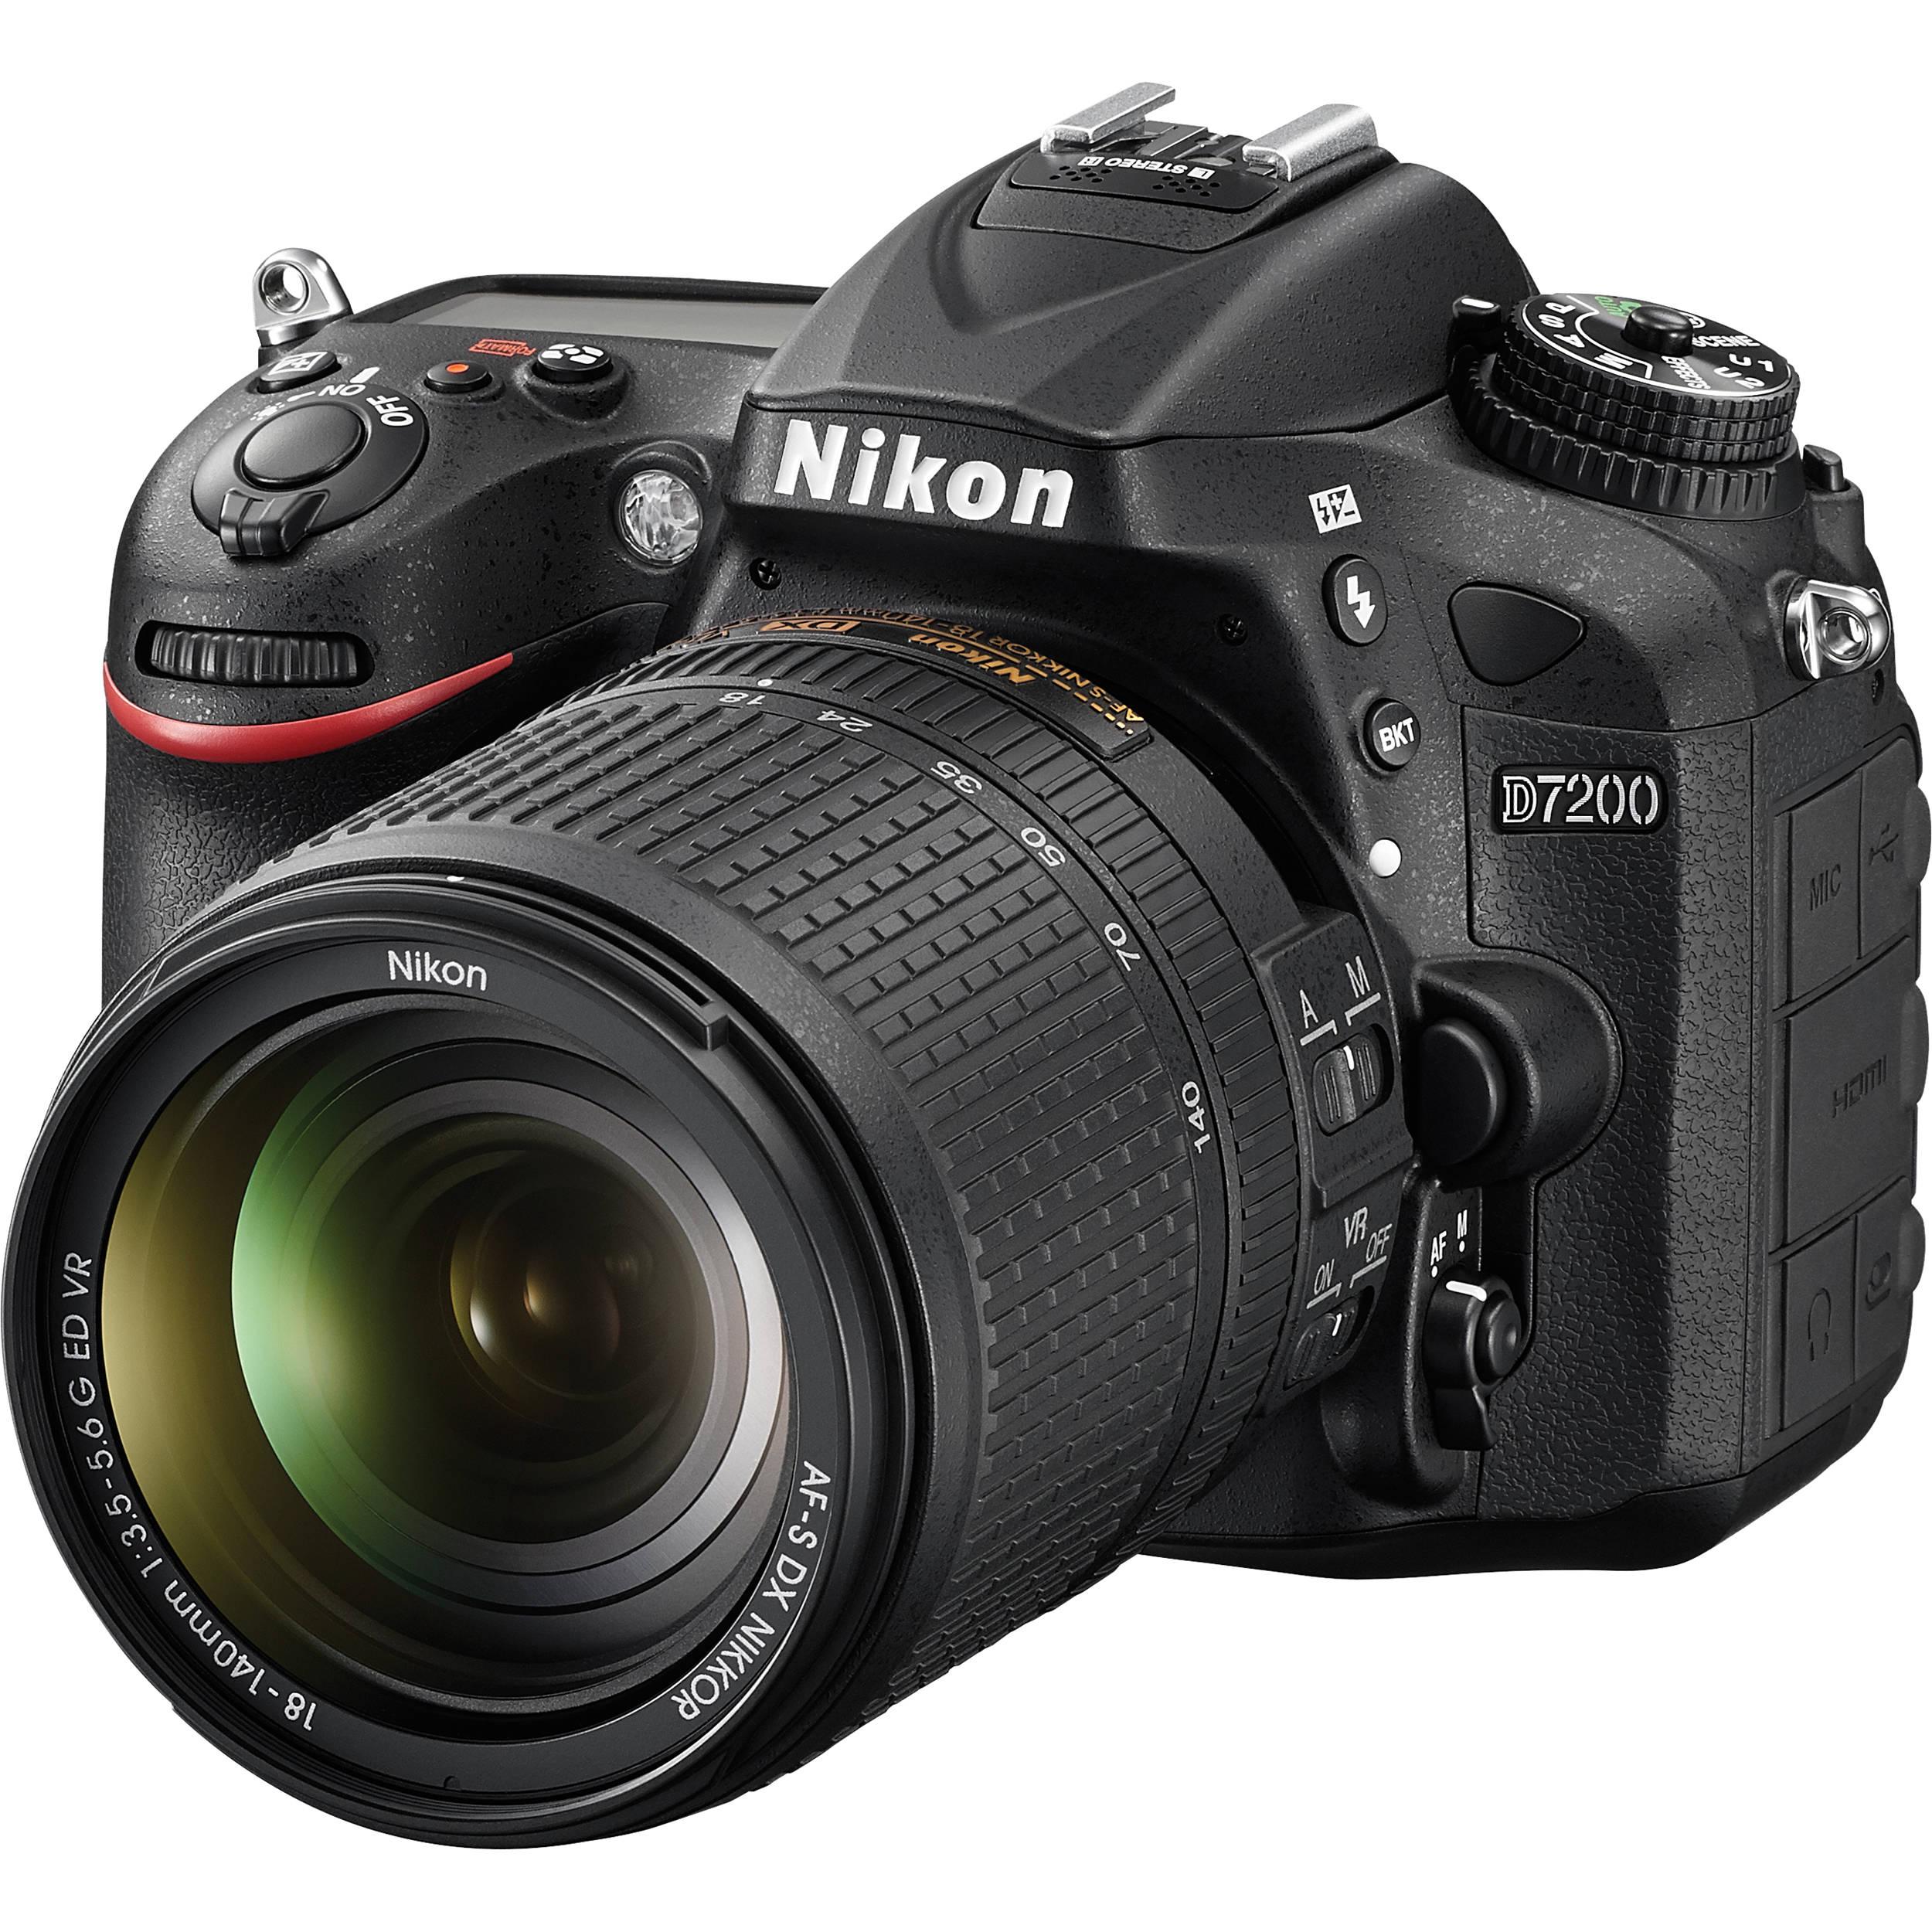 Nikon camera photo